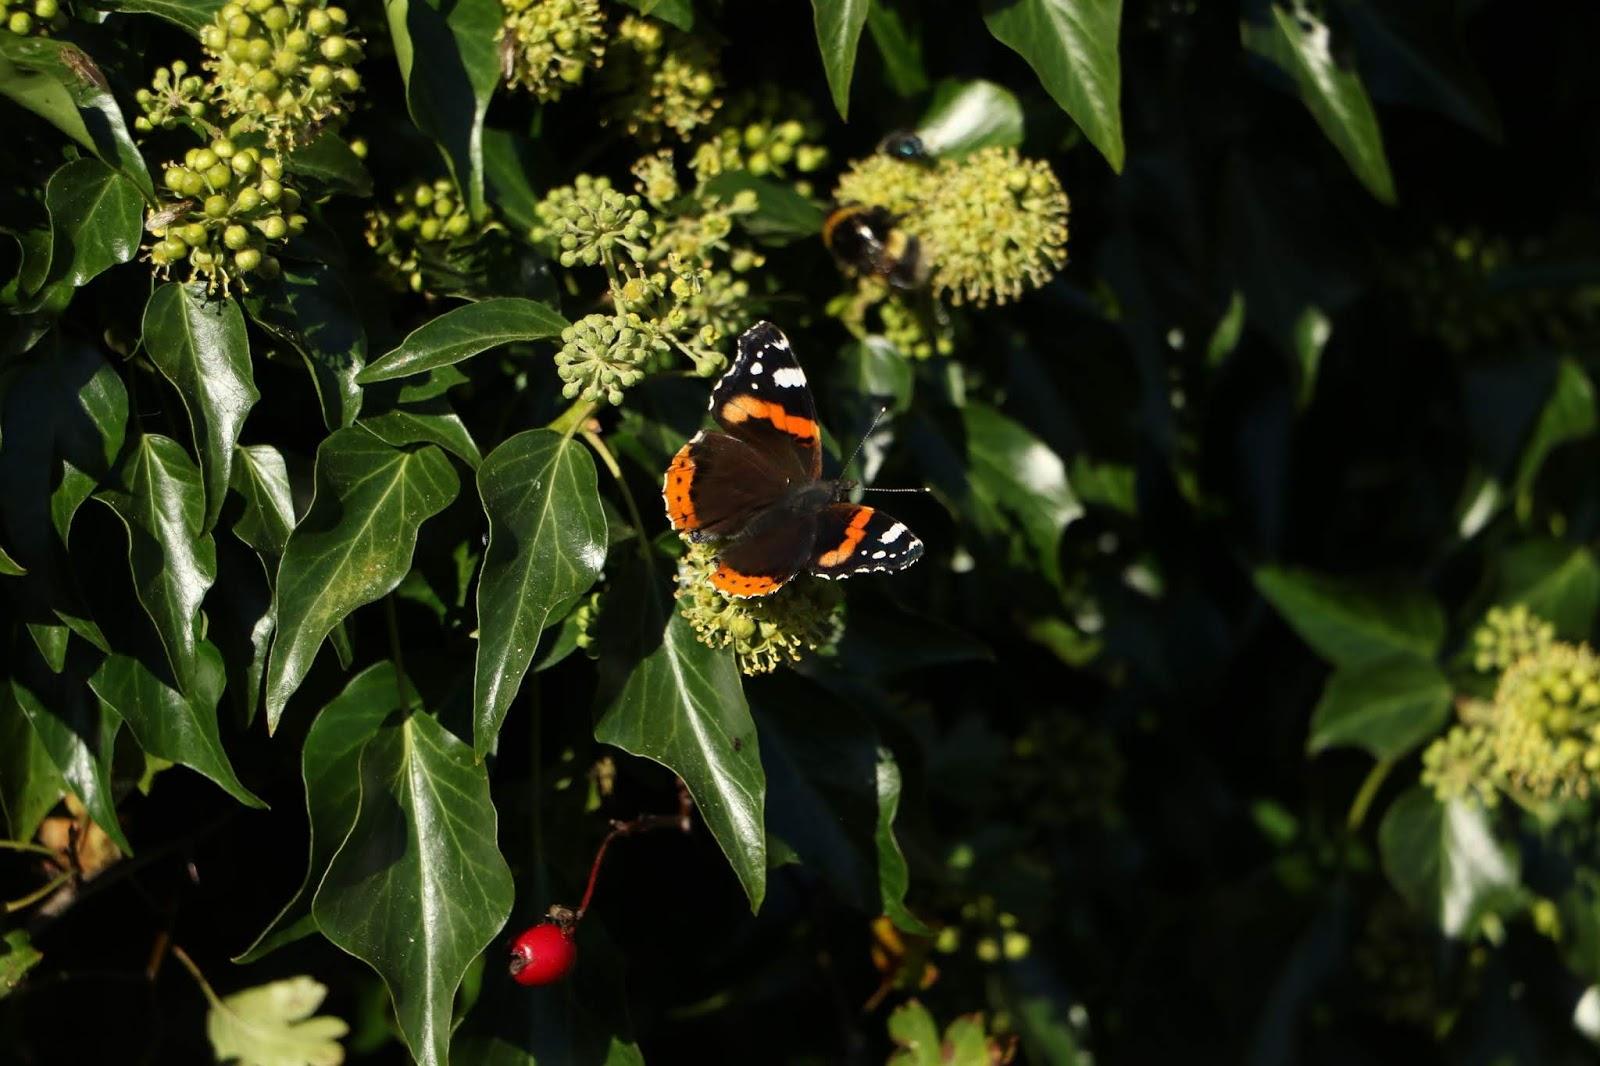 Calderdale Moths Butterflies And Dragonflies Fence 16 2 Butterfly New Peacock